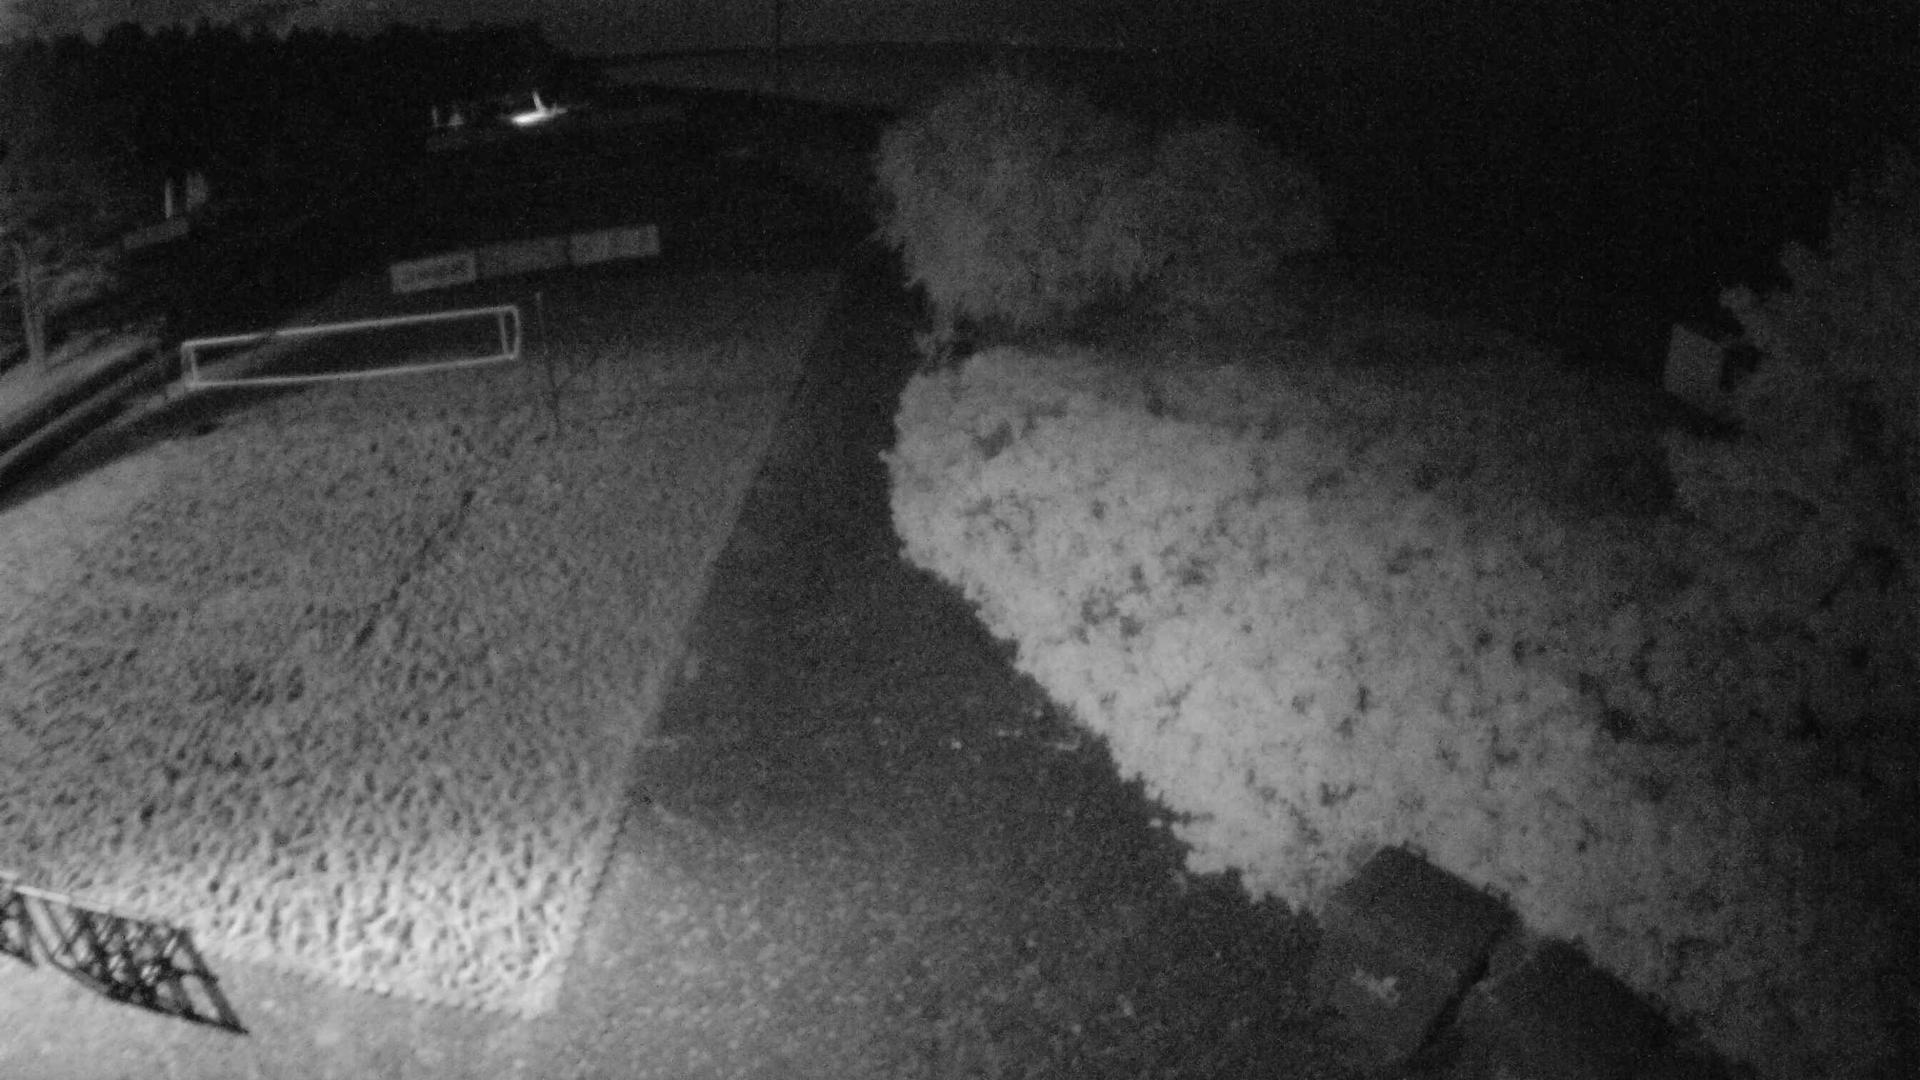 Webkamera Saulkrasti: Jūras parks / Sea Park − Saulkrasti Be